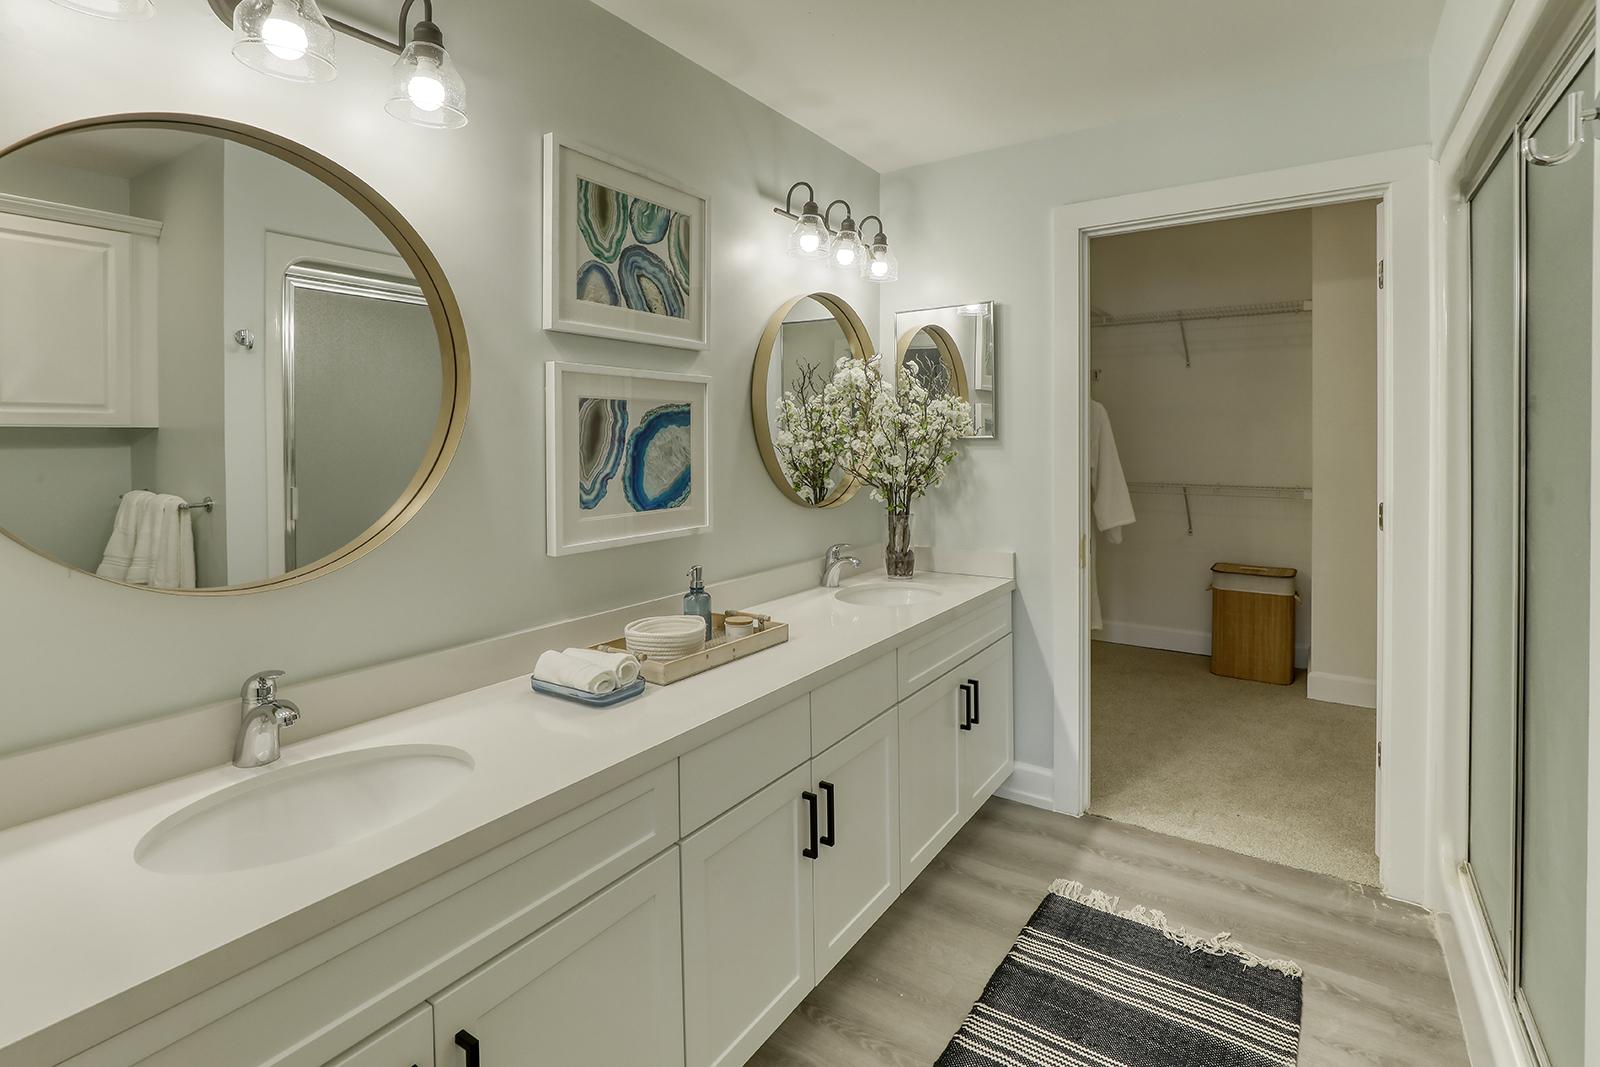 Unisen Villa - Master Bathroom and Walk-in Closet